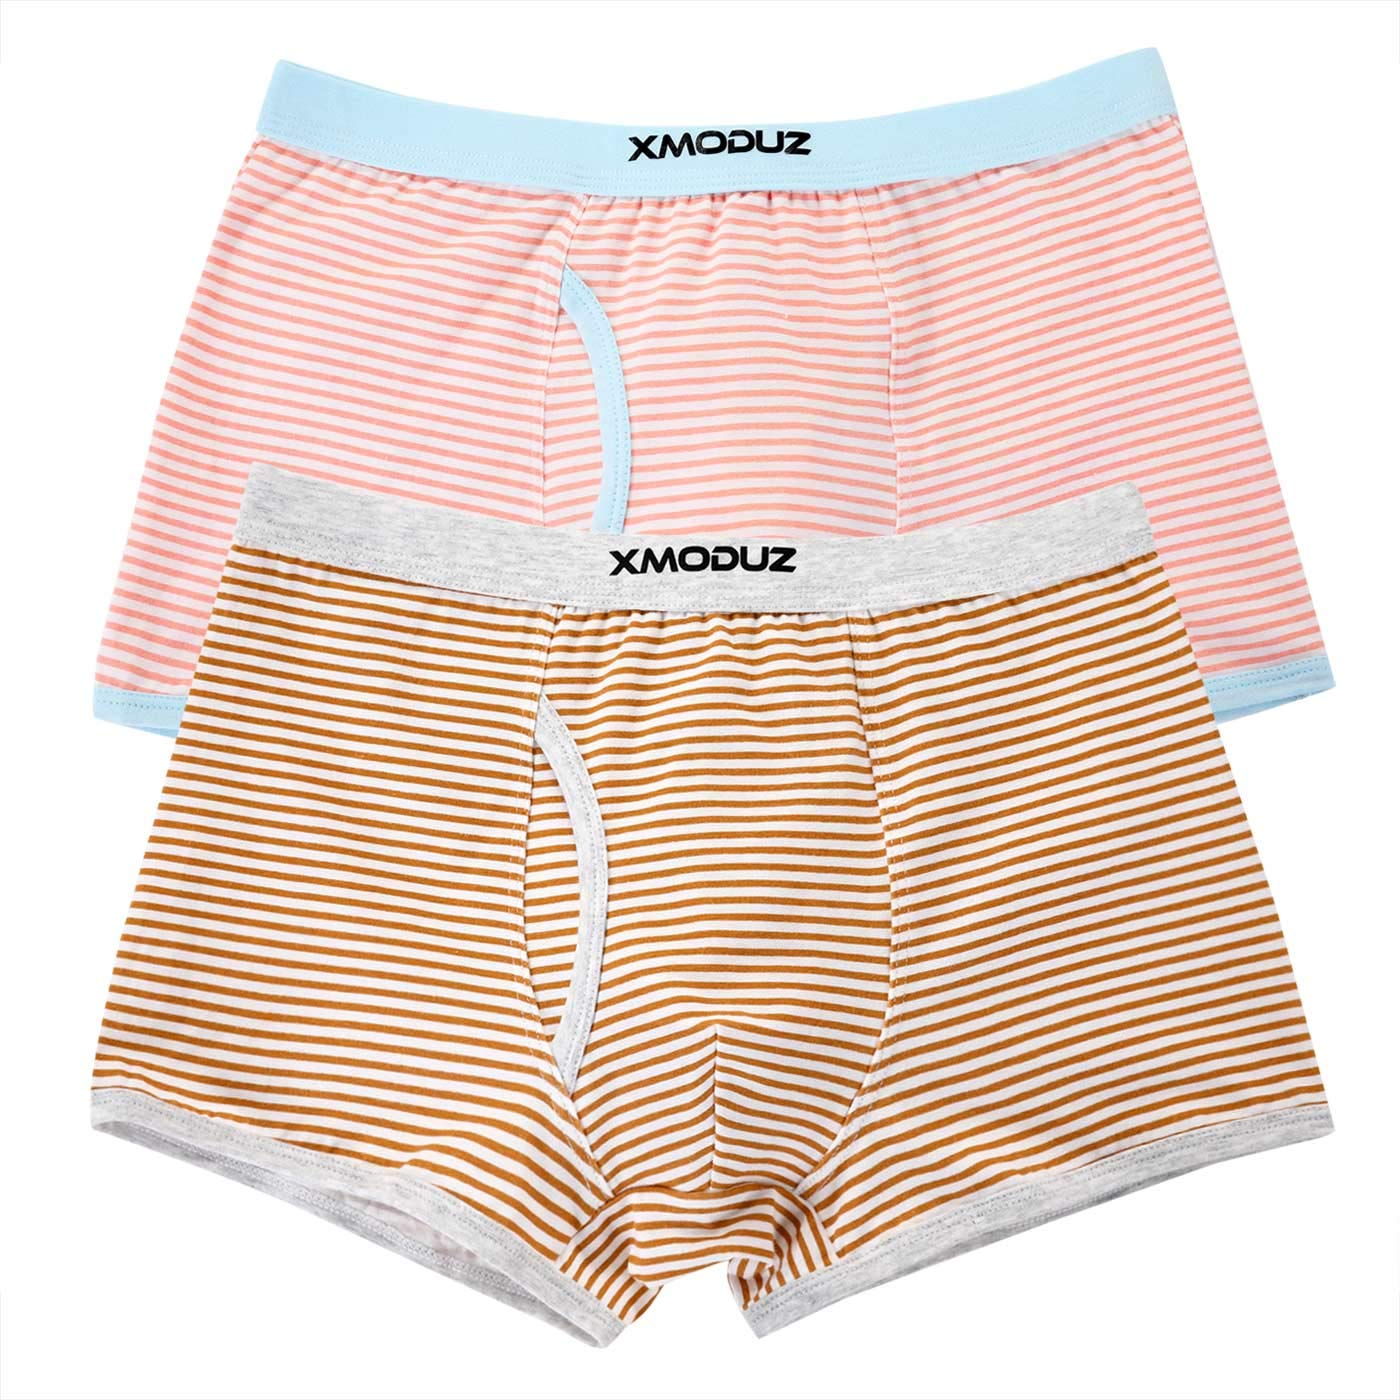 Xiaomaoduizhang Toddler Little Boys Soft Cotton Boxer Briefs Underwear 2 Pack Boys' 2-Pack Athletic Pink+Brown 110cm